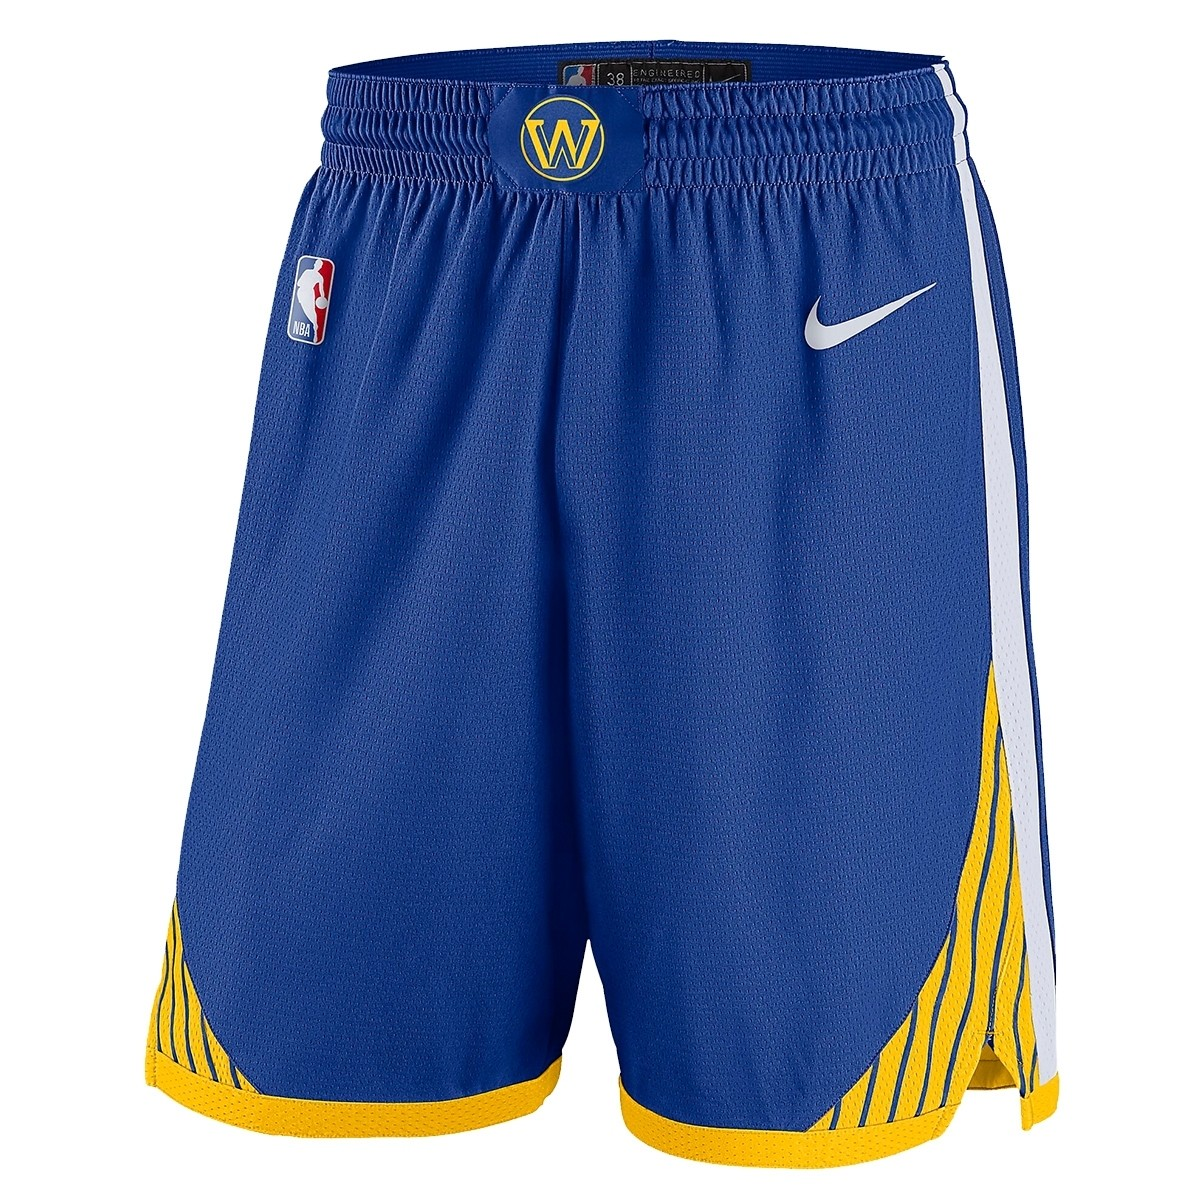 Nike Jr NBA Golden State Warriors Swingman Short 'Icon Edition'